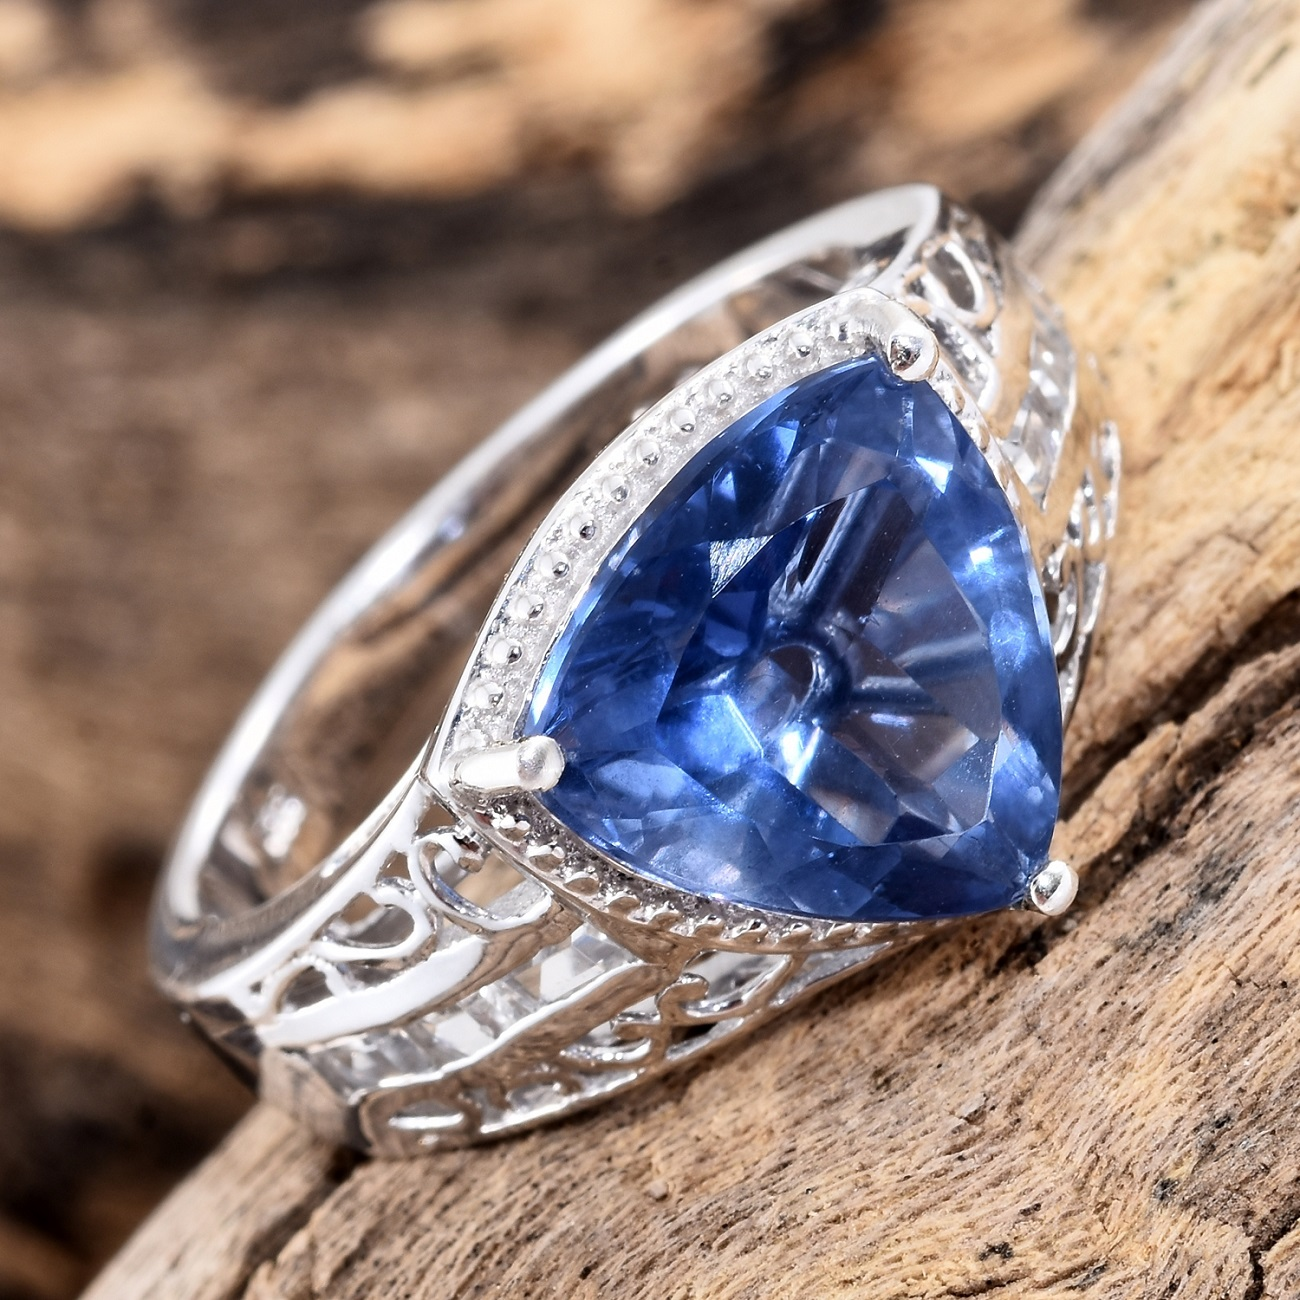 pierre fluorite bleue